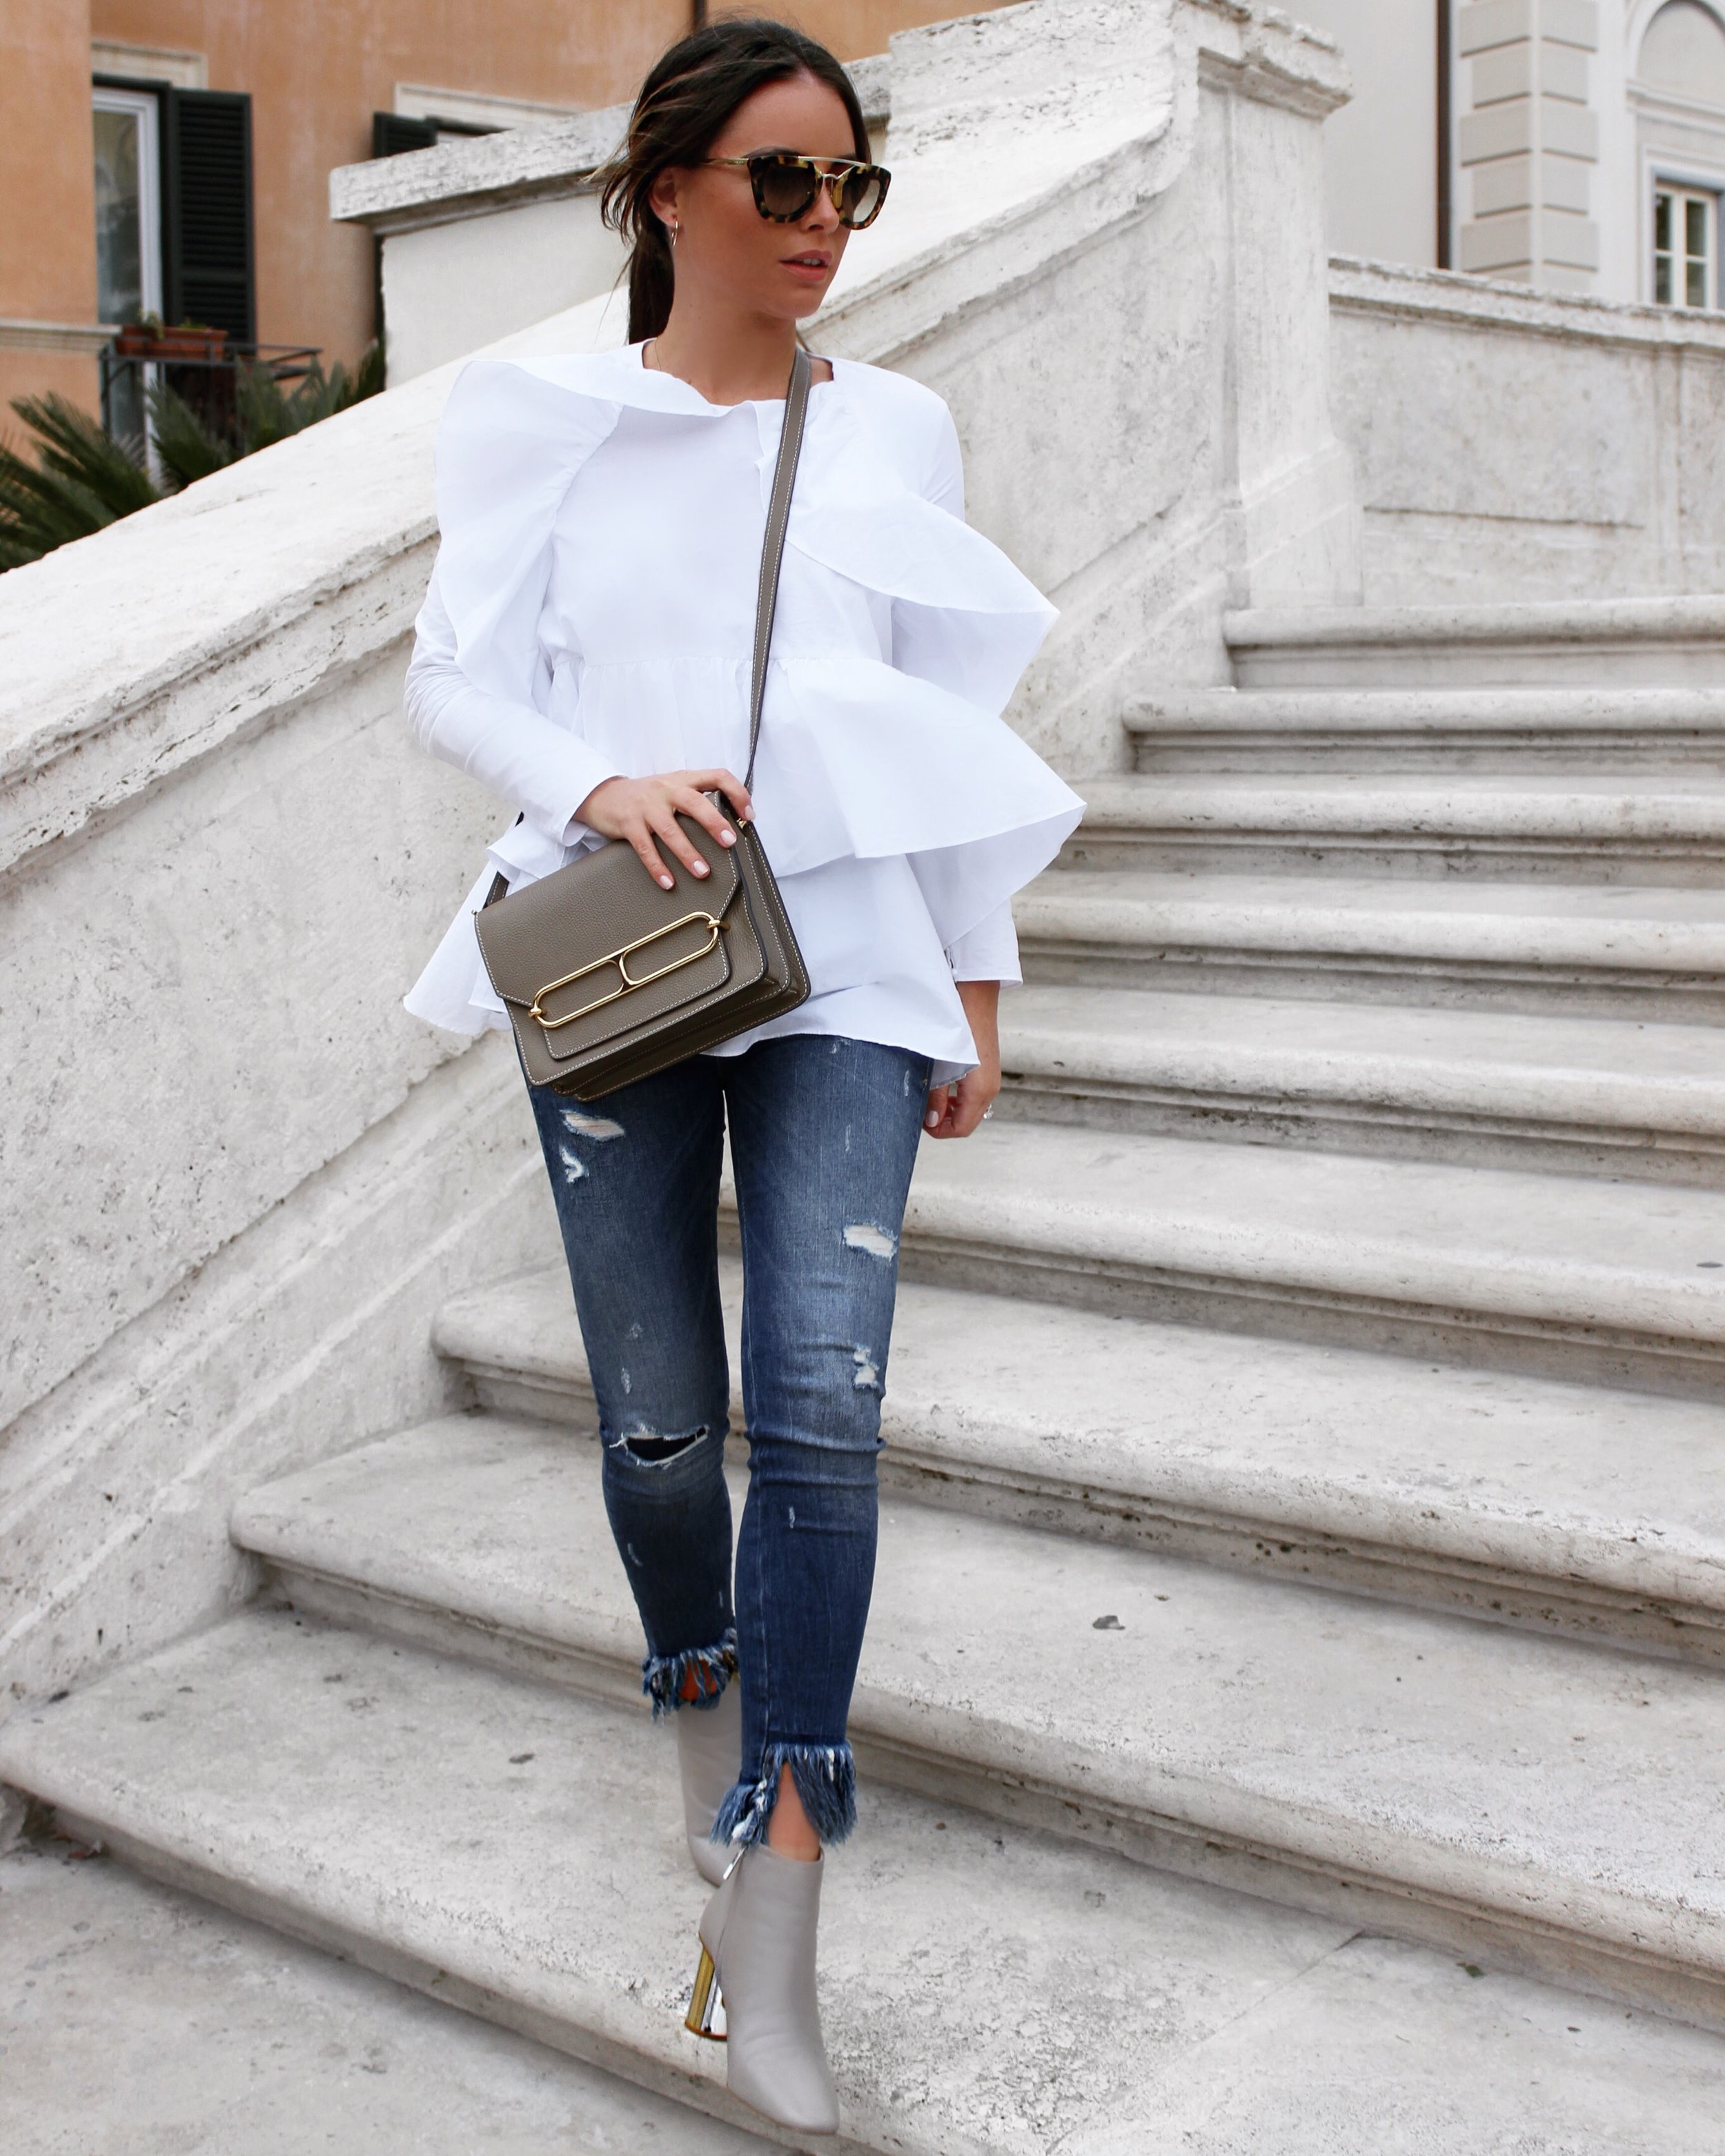 Zara Top  here,  Zara Jeans  here,  Zara Boots  here , Prada Sunglasses  here , Hermes Roulis Bag